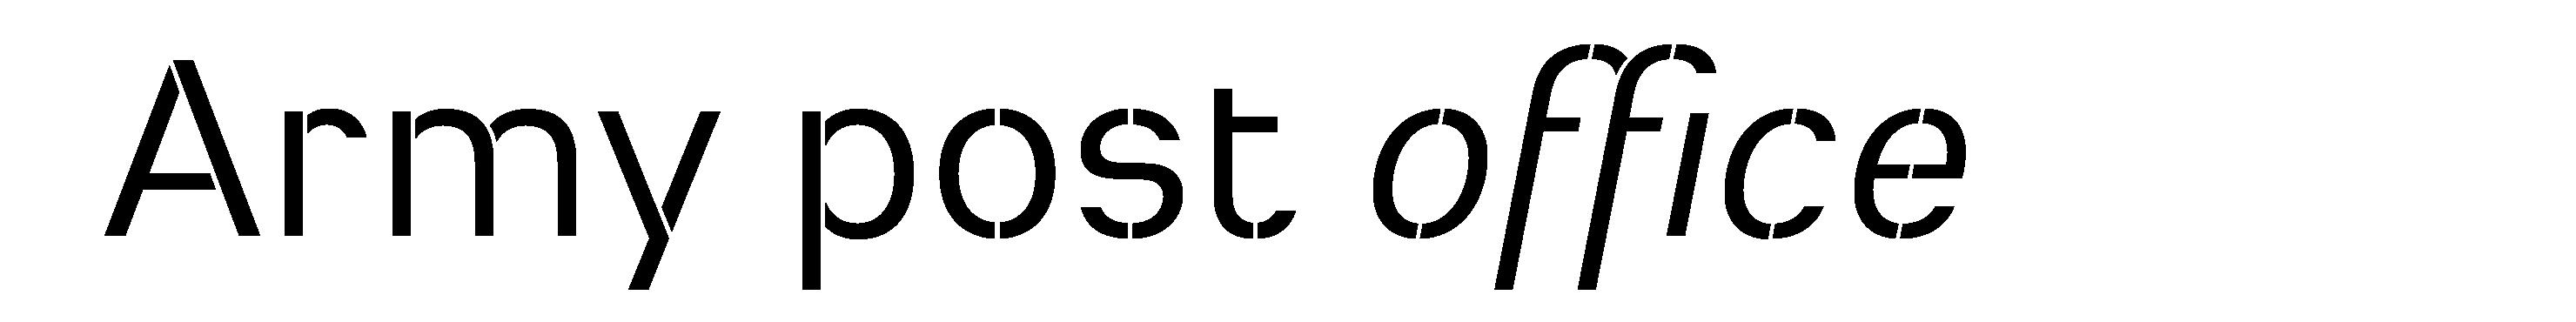 Typeface Heimat Stencil D09 Atlas Font Foundry